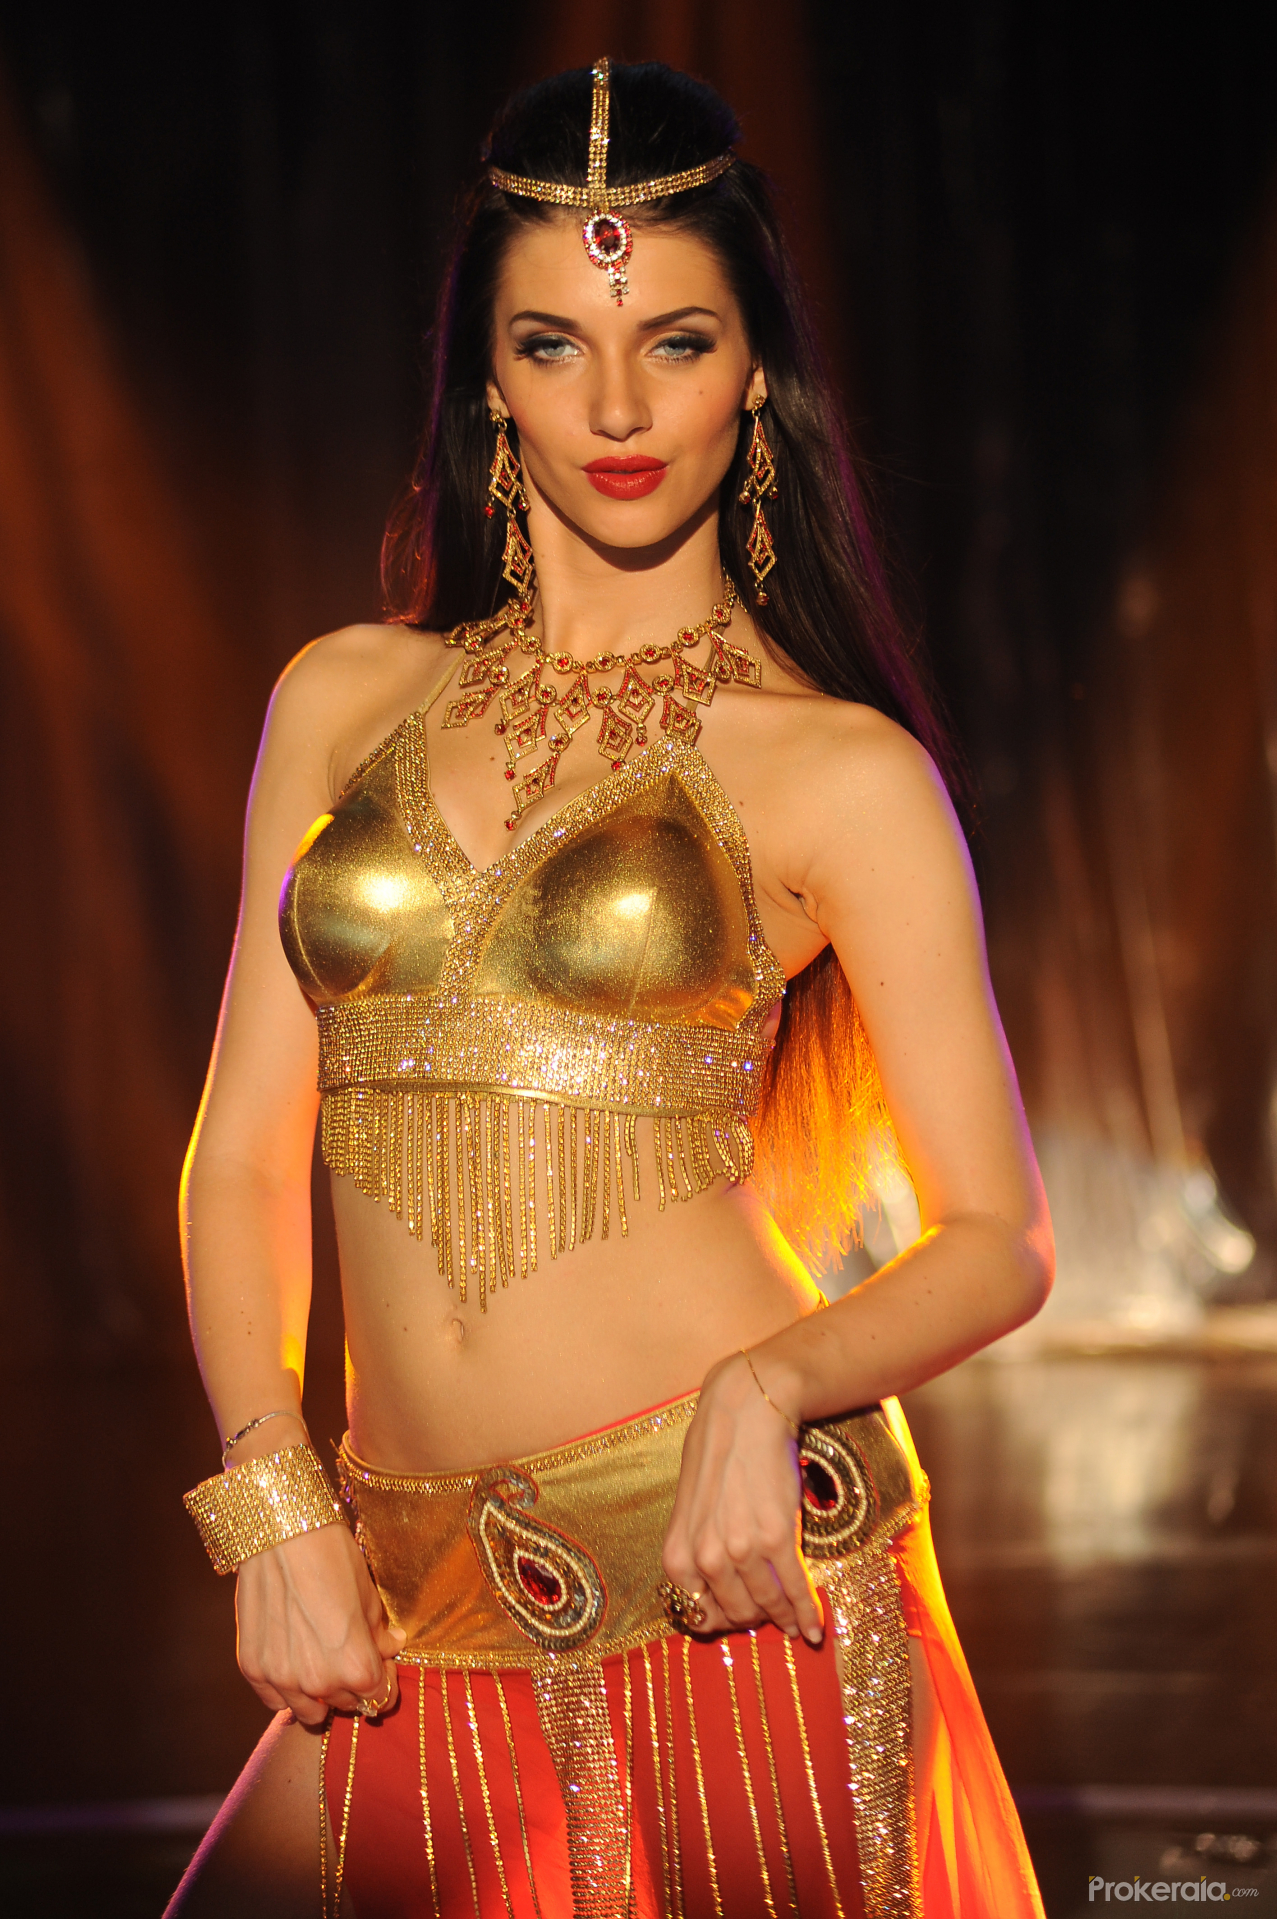 Genius telugu movie hot stills scarlet hot item dance stills friom download wallpaper altavistaventures Images